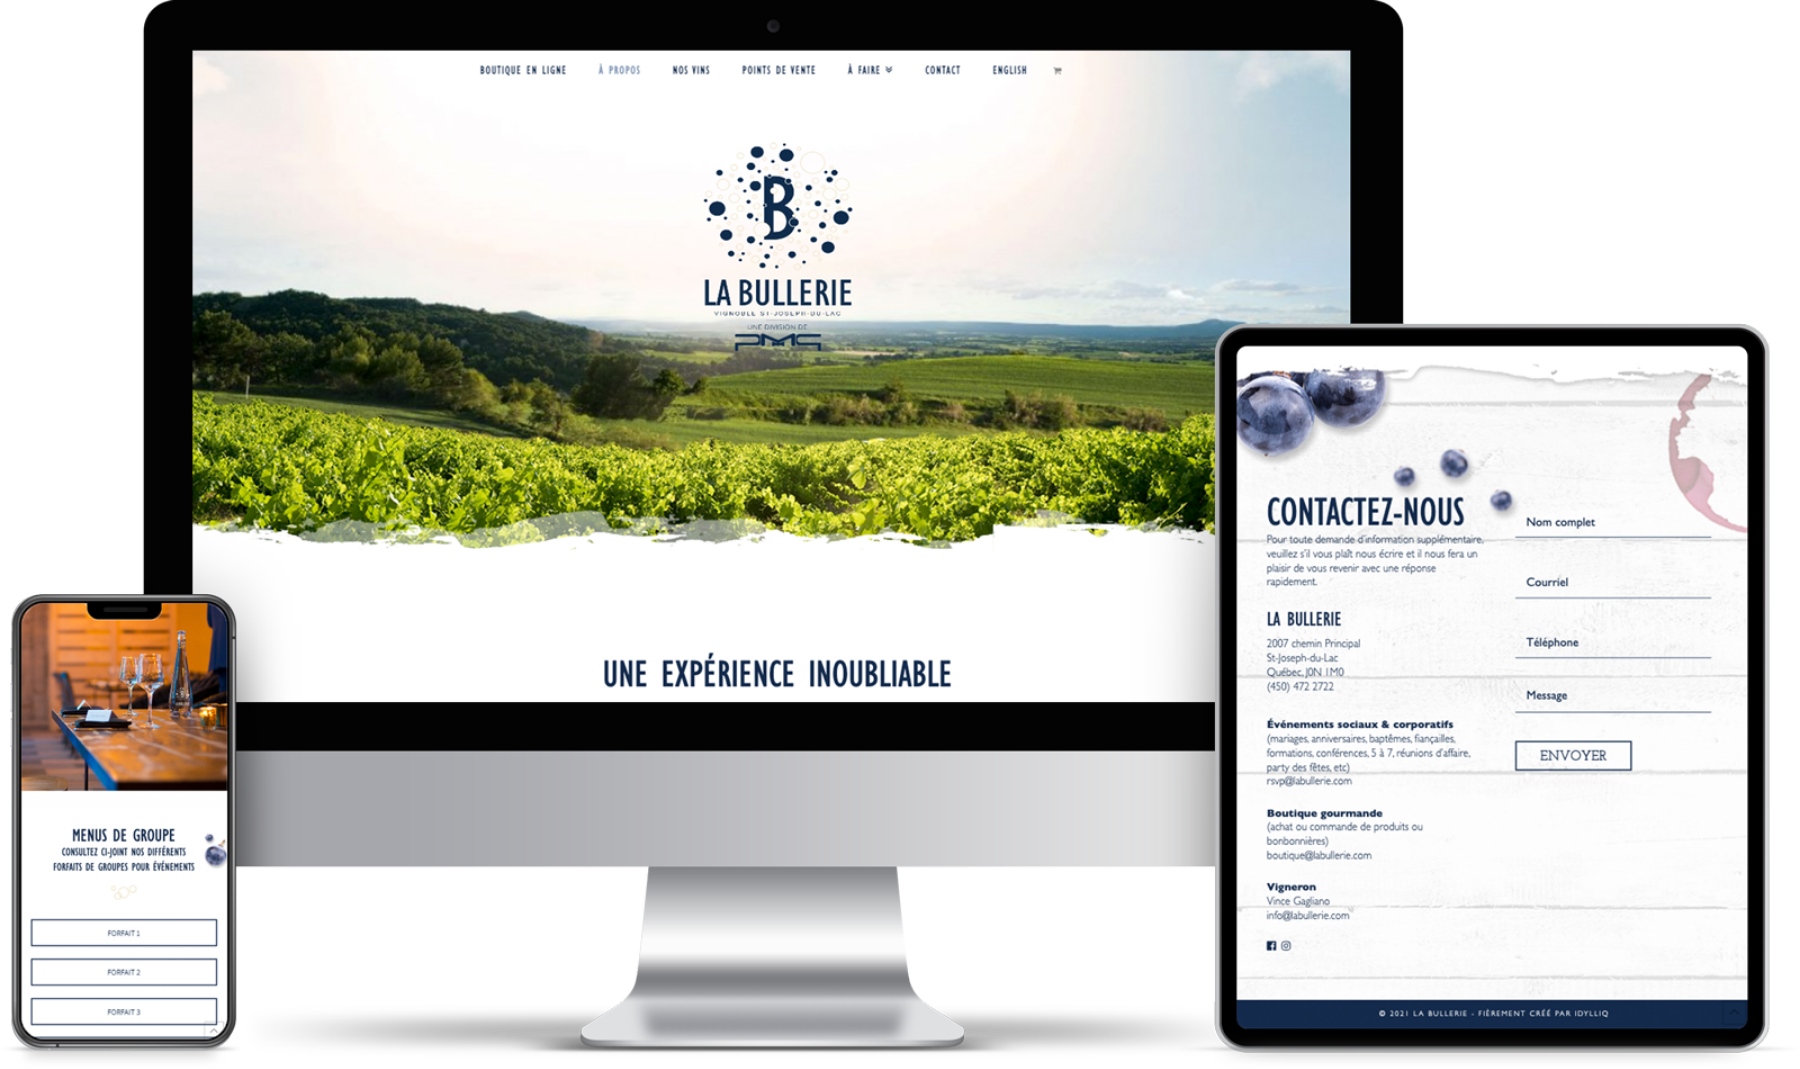 La Bullerie - Idylliq - Site webs